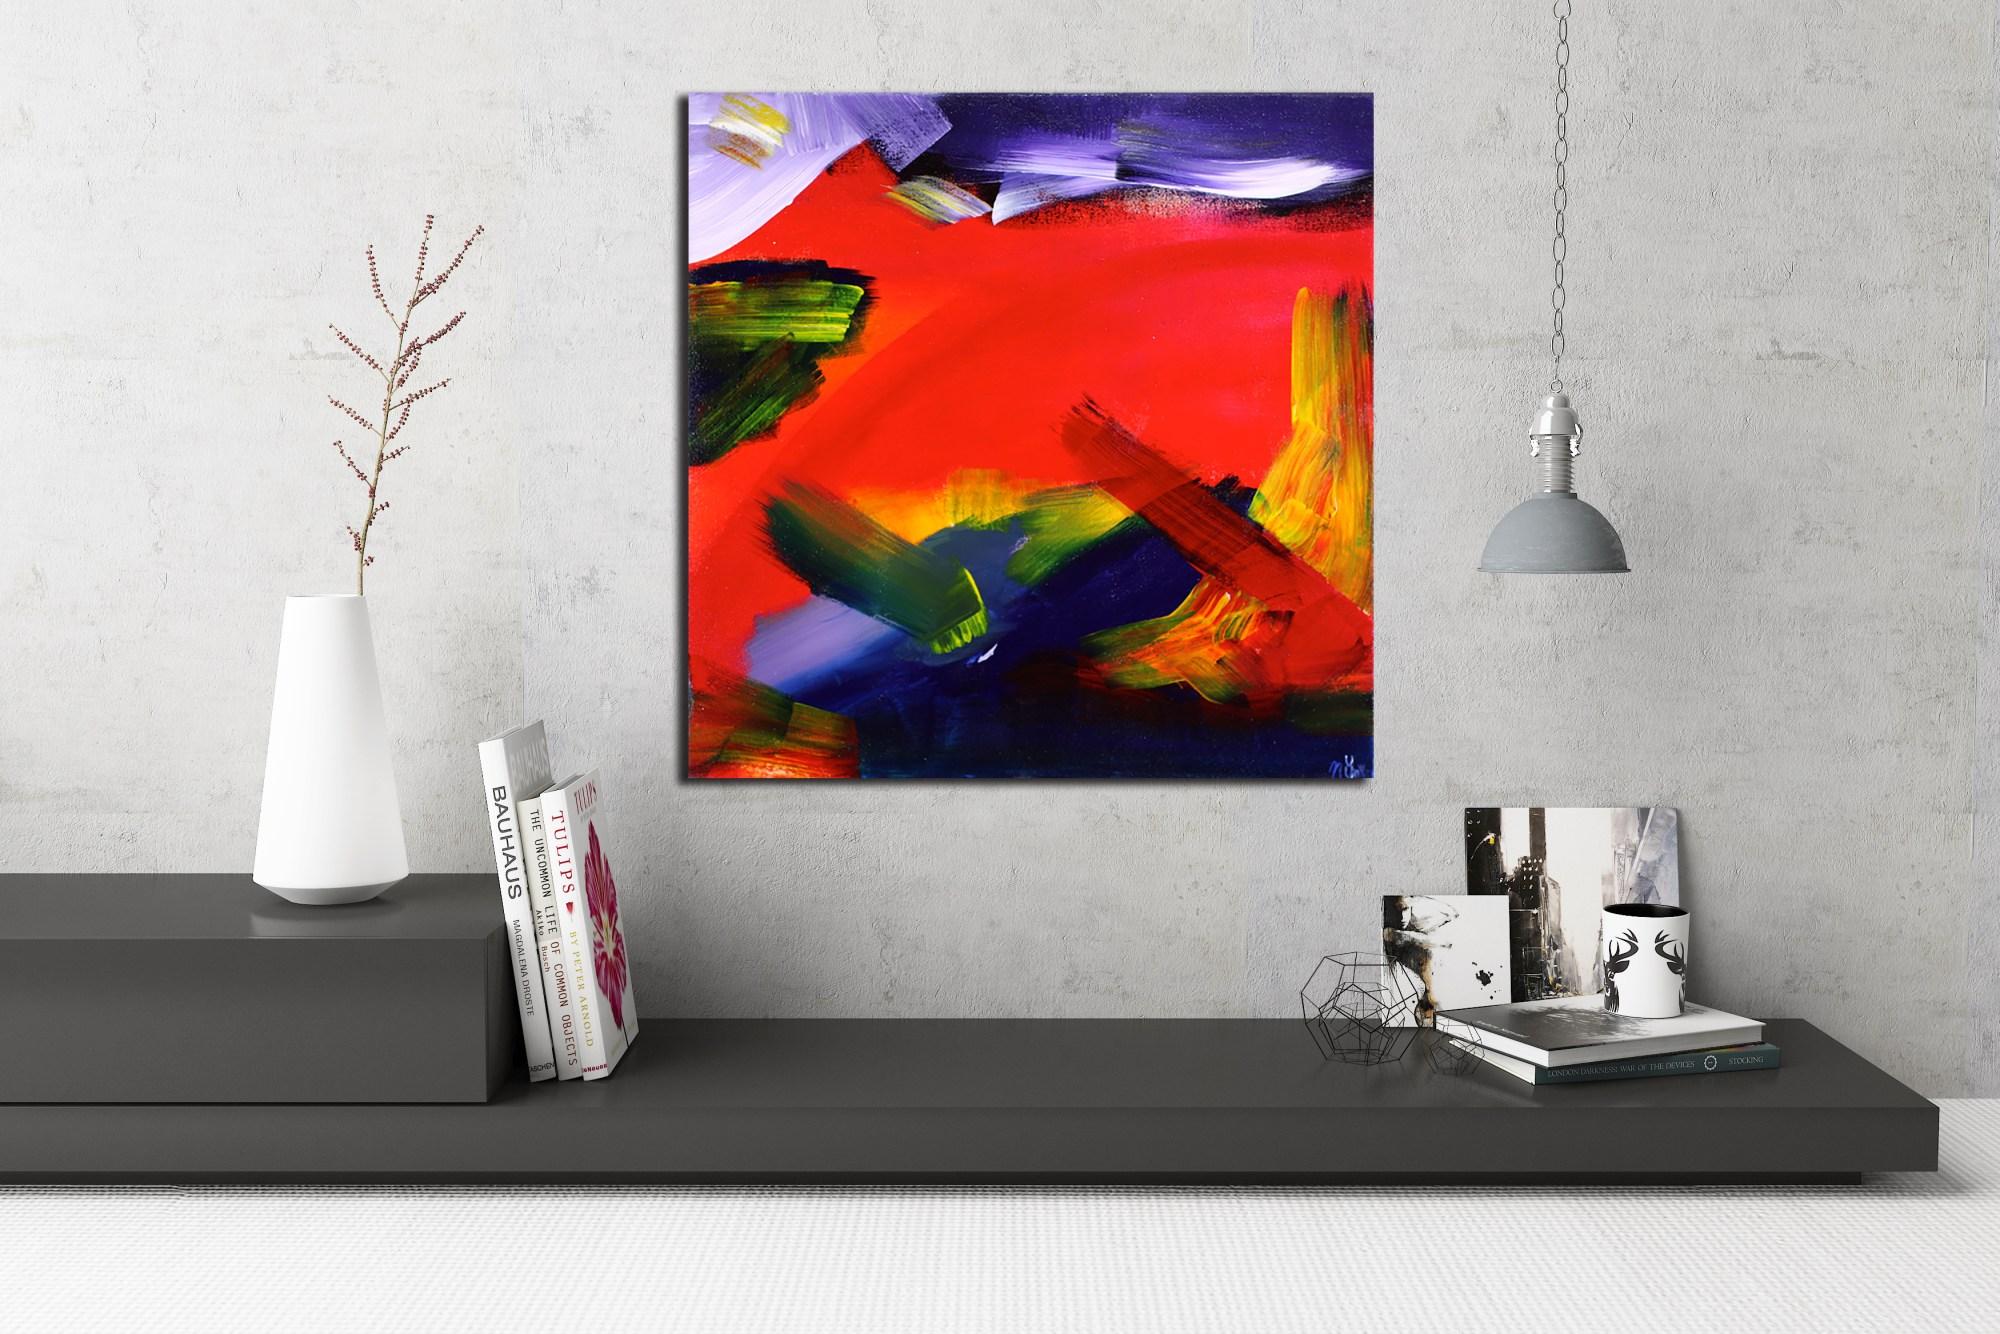 Fiery Dreams - 9.5 Hour Series (2014) Acrylic painting by Nestor Toro